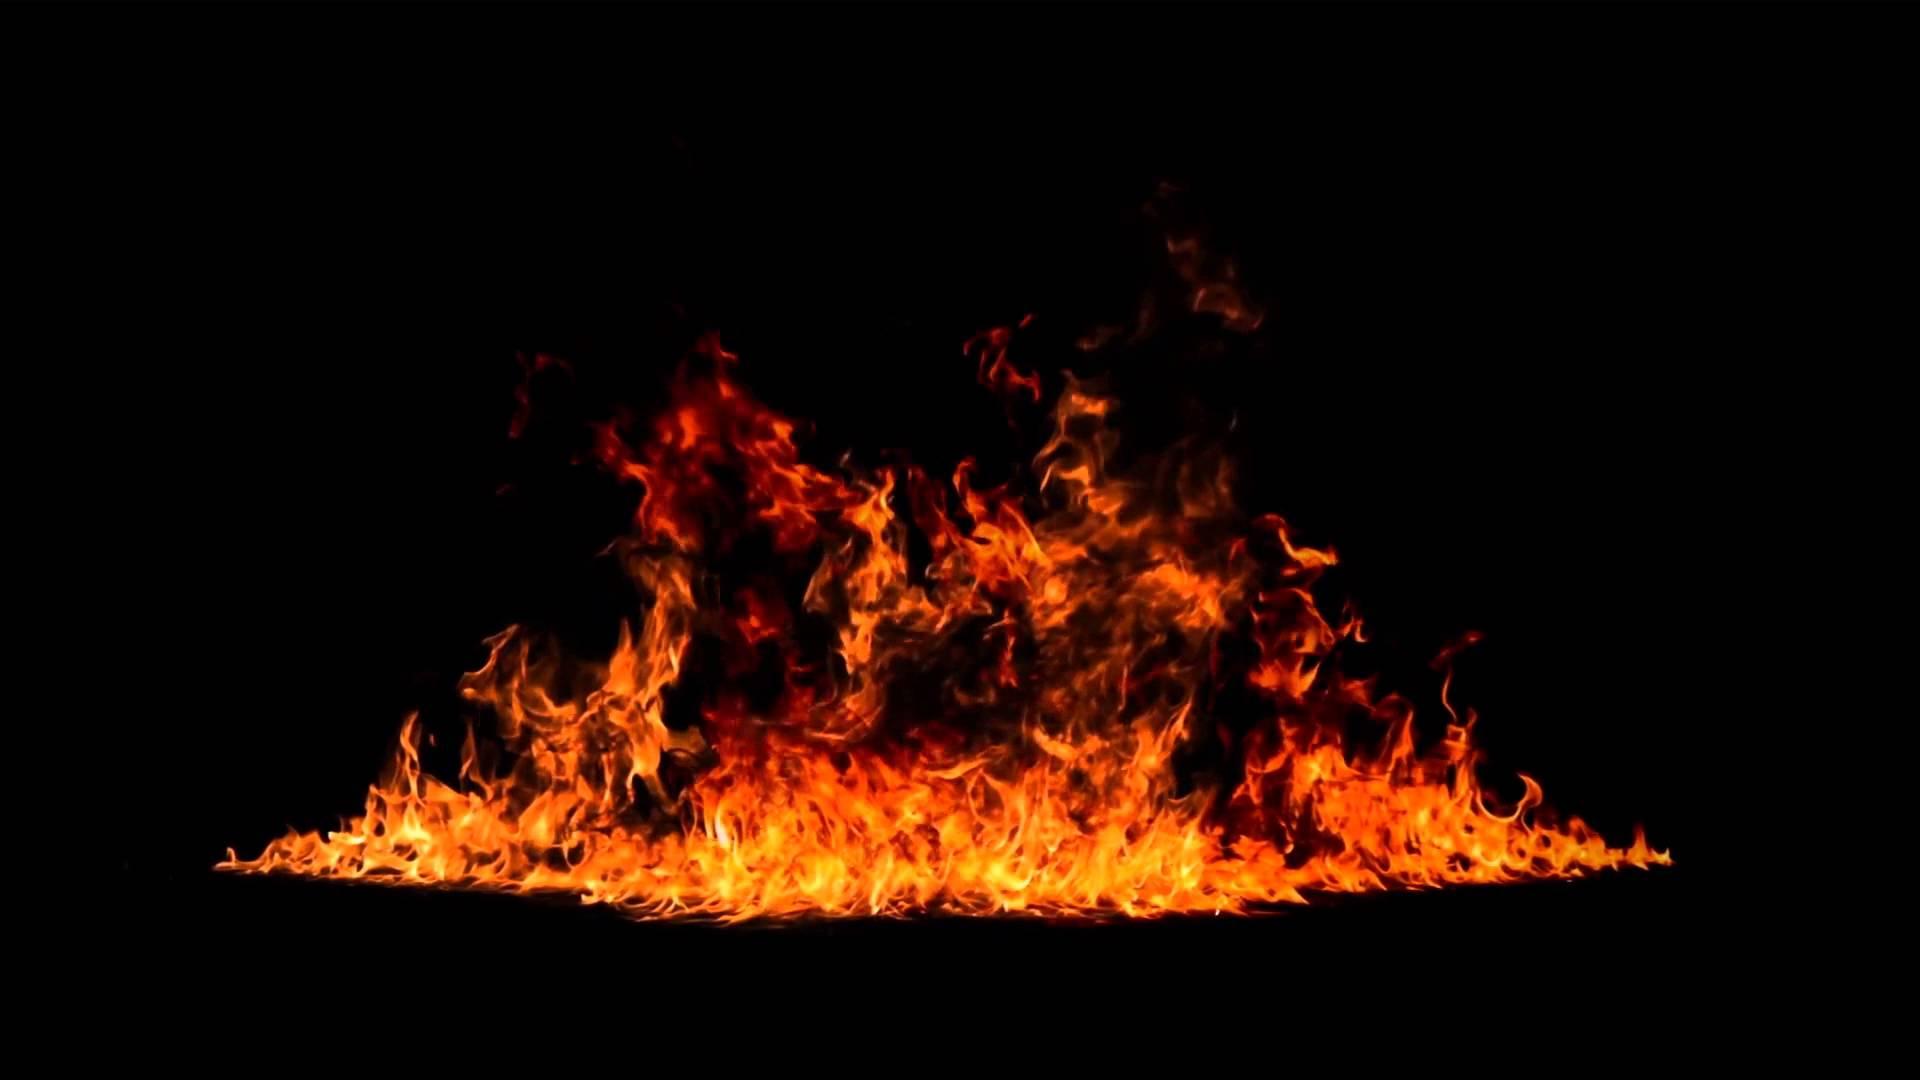 Free Animated Fireplace Wallpaper Inextinguishable Flame Ben Tzion Spitz